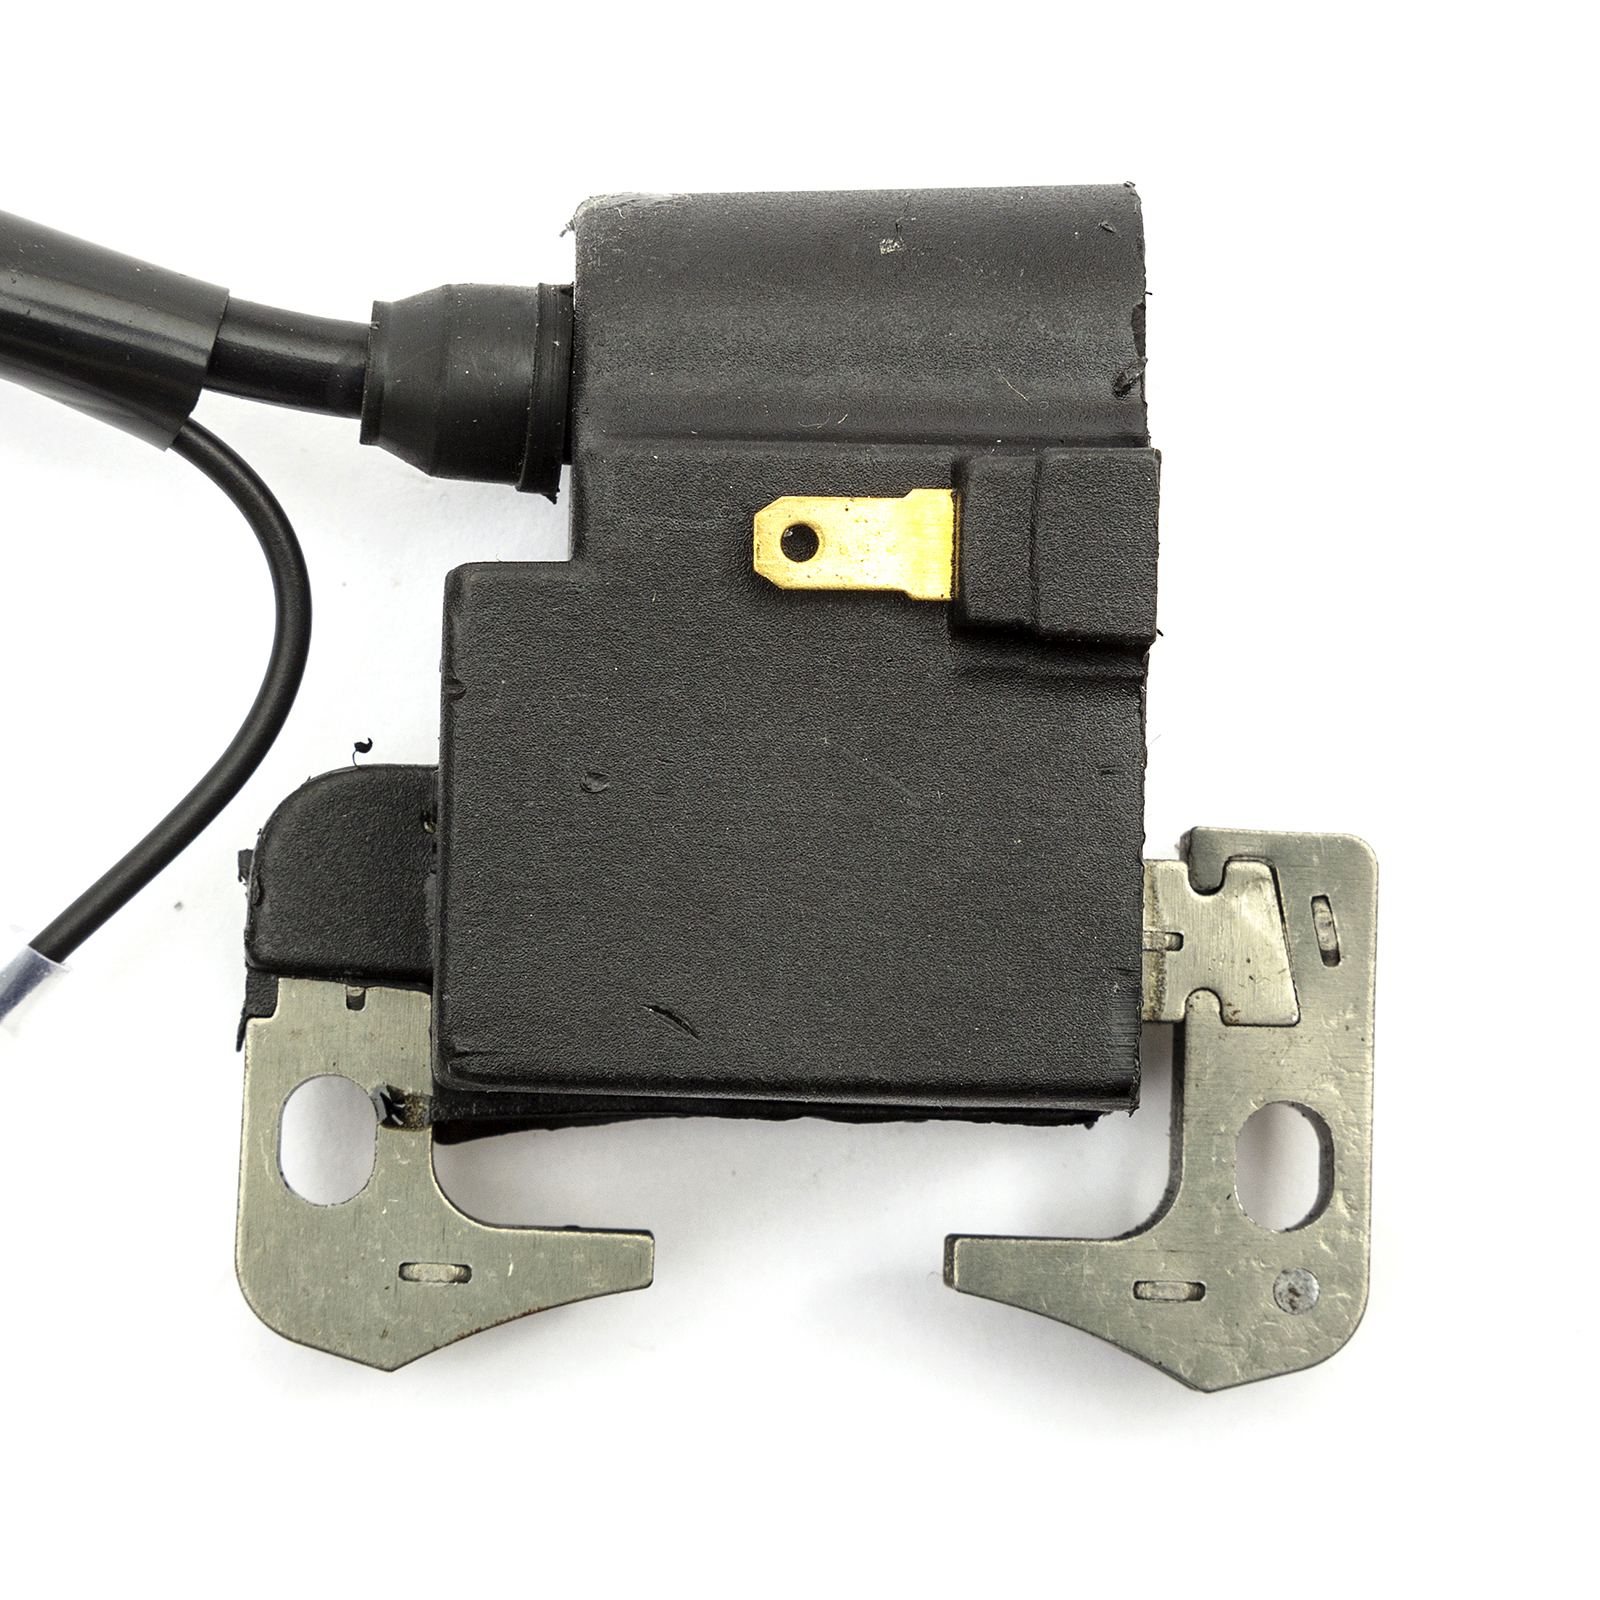 47cc 49cc MiniMoto Mini Dirt Bike Quad Ignition Coil HT Lead Spark Plug Cap CDI